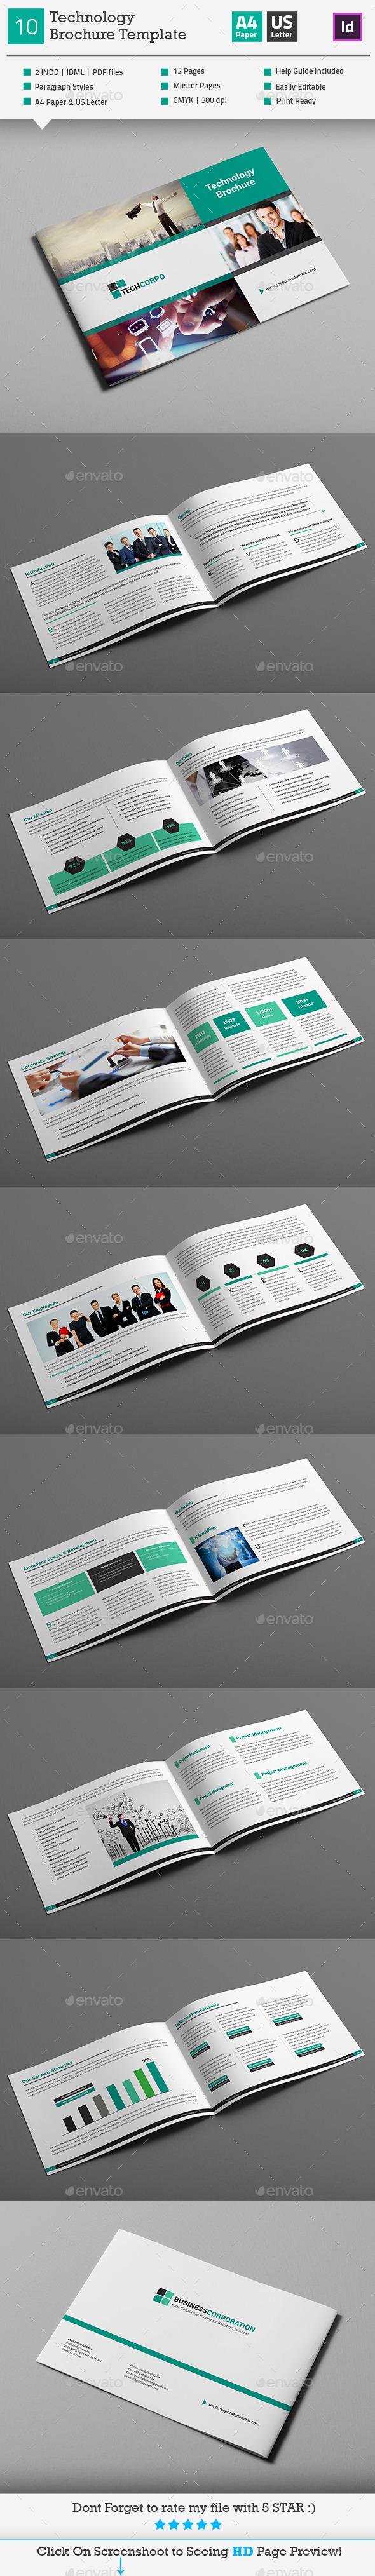 GraphicRiver Technology Landscape Brochure Template V10 11030221